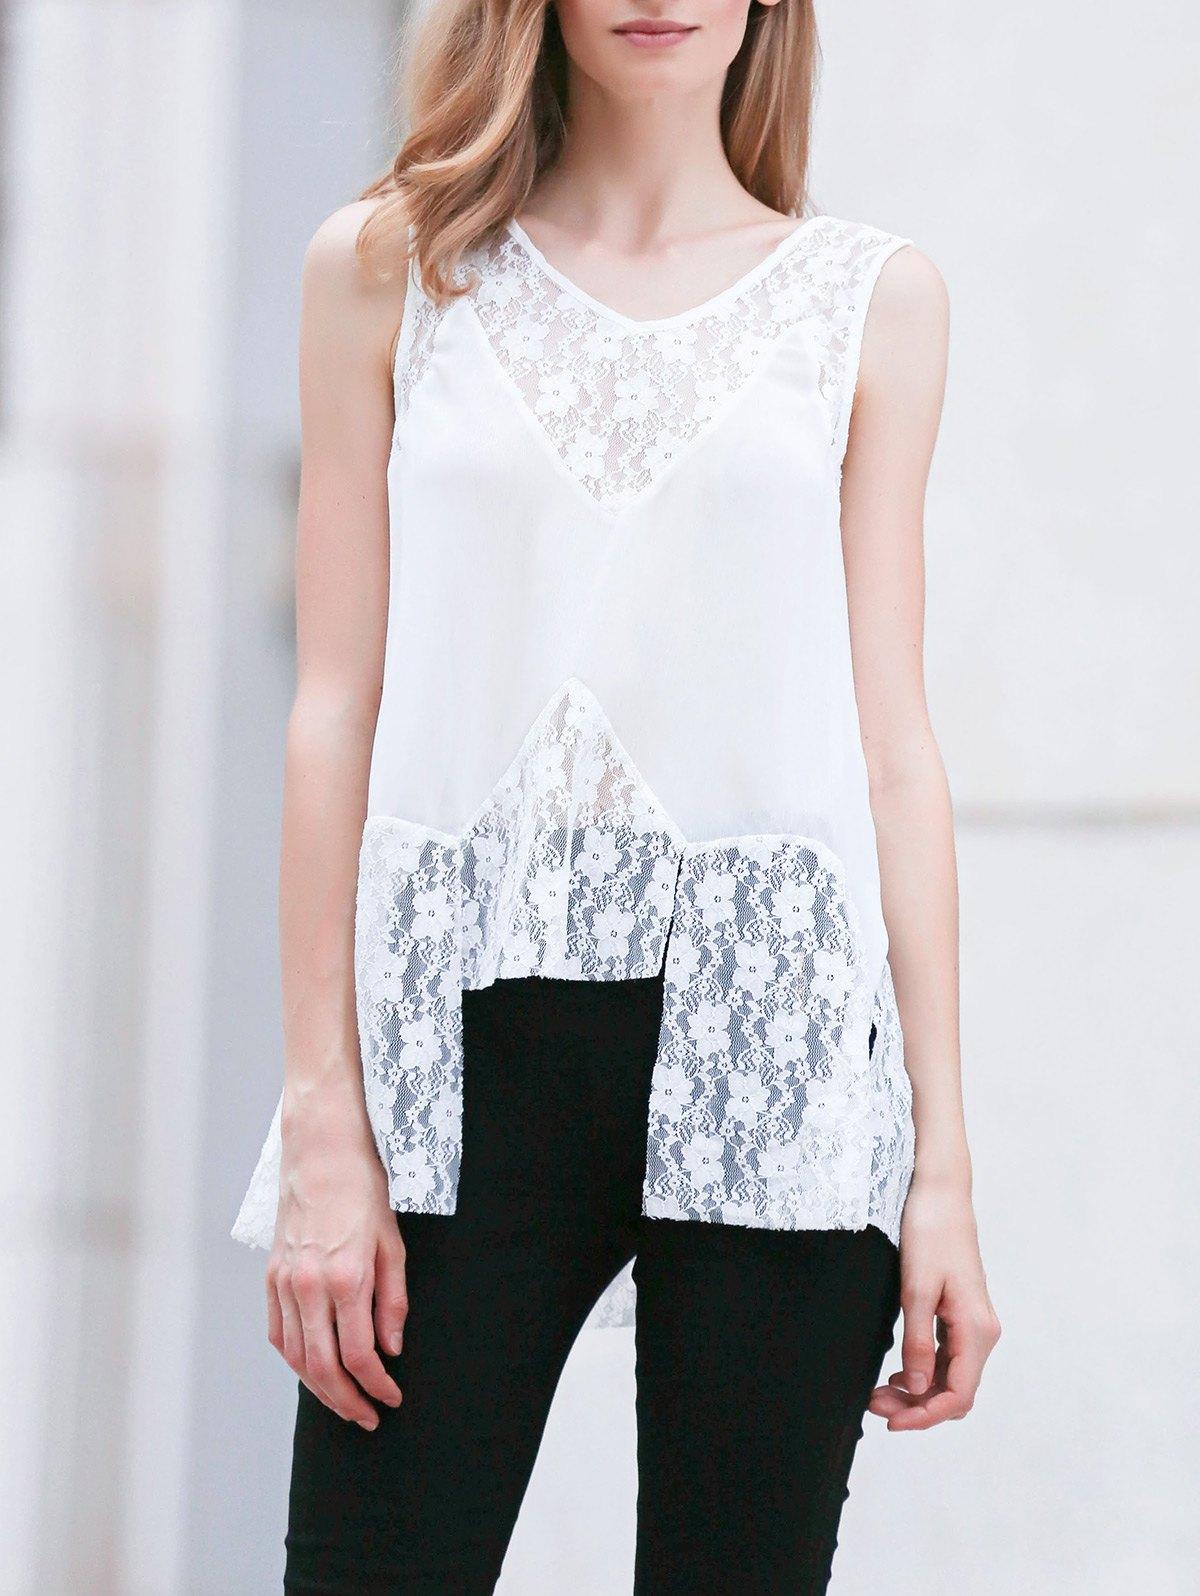 Lace Splice V Neck Sleeveless White Blouse 177344502